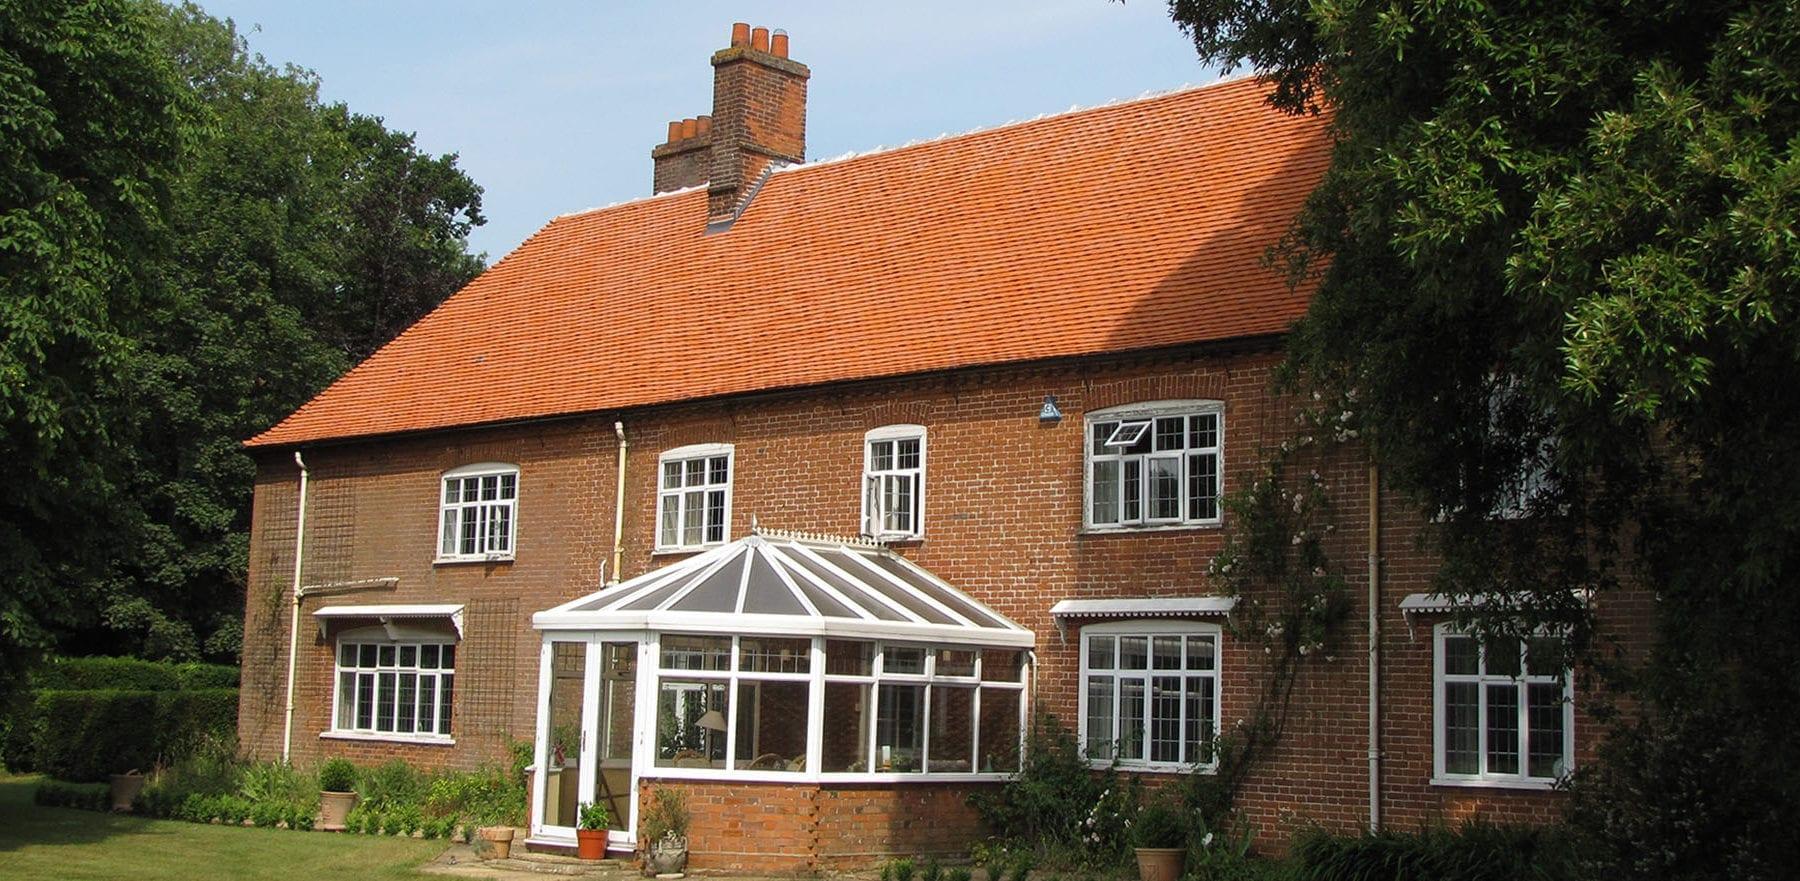 Lifestiles - Handcrafted Orange Clay Roof Tiles - Wisset Hall, England 3